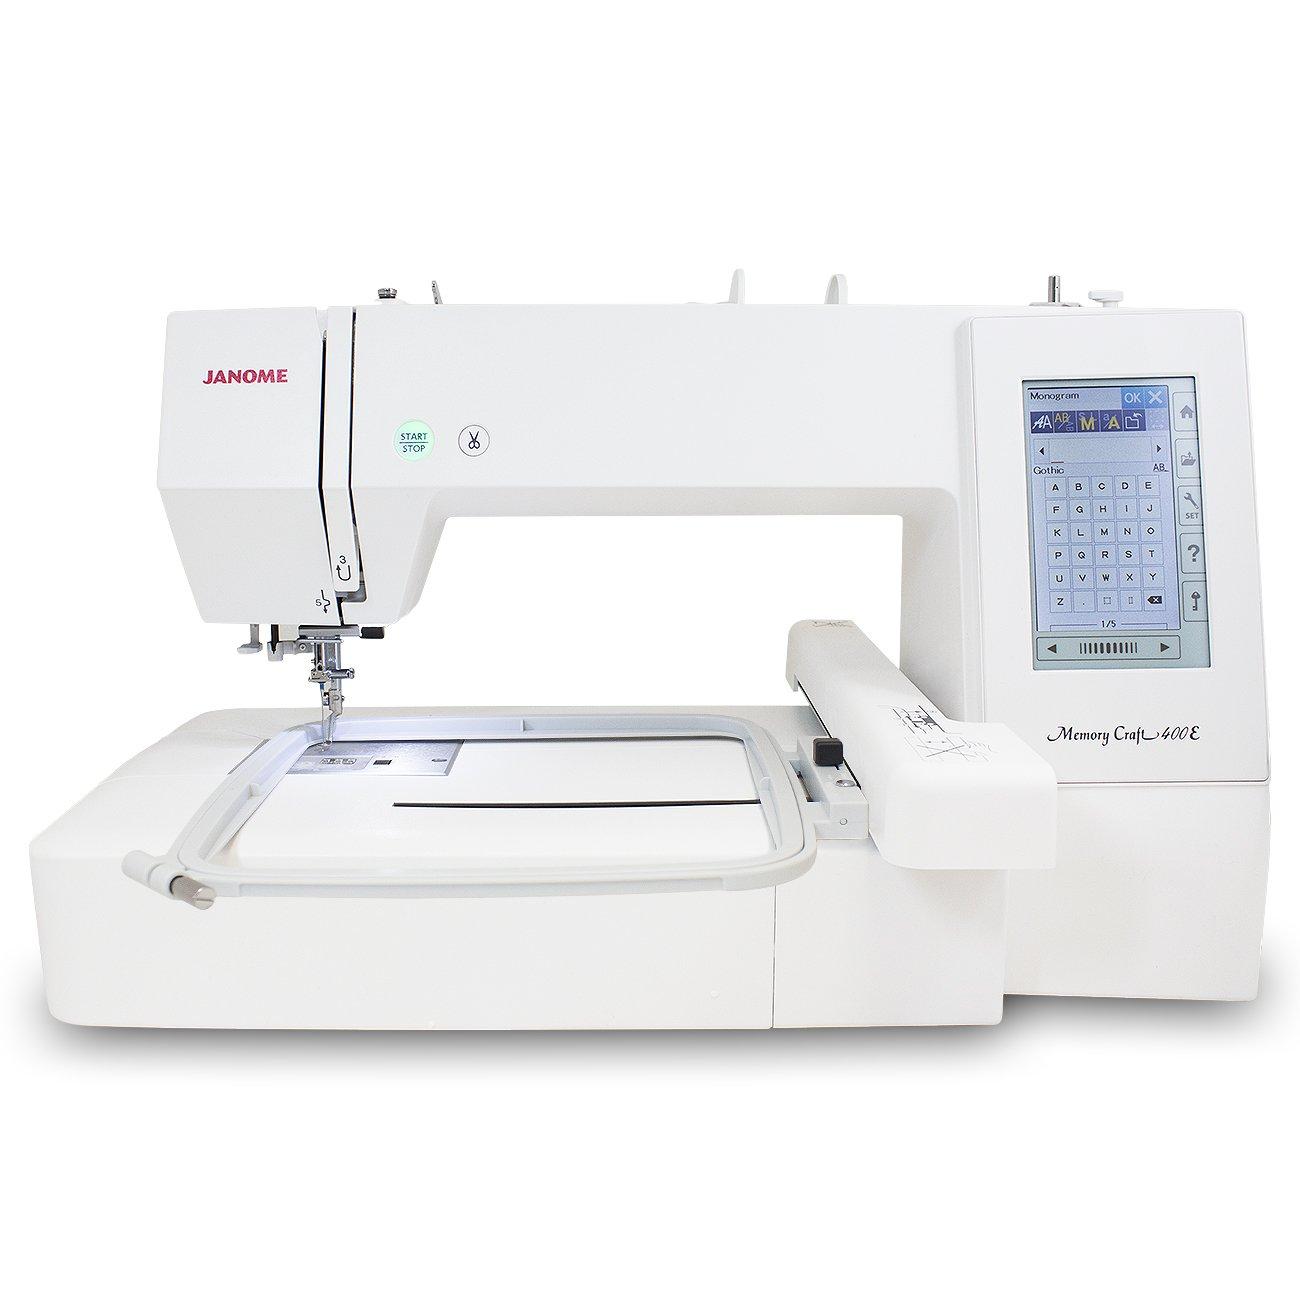 Janome Memory Craft 400E Embroidery Machine MC400E